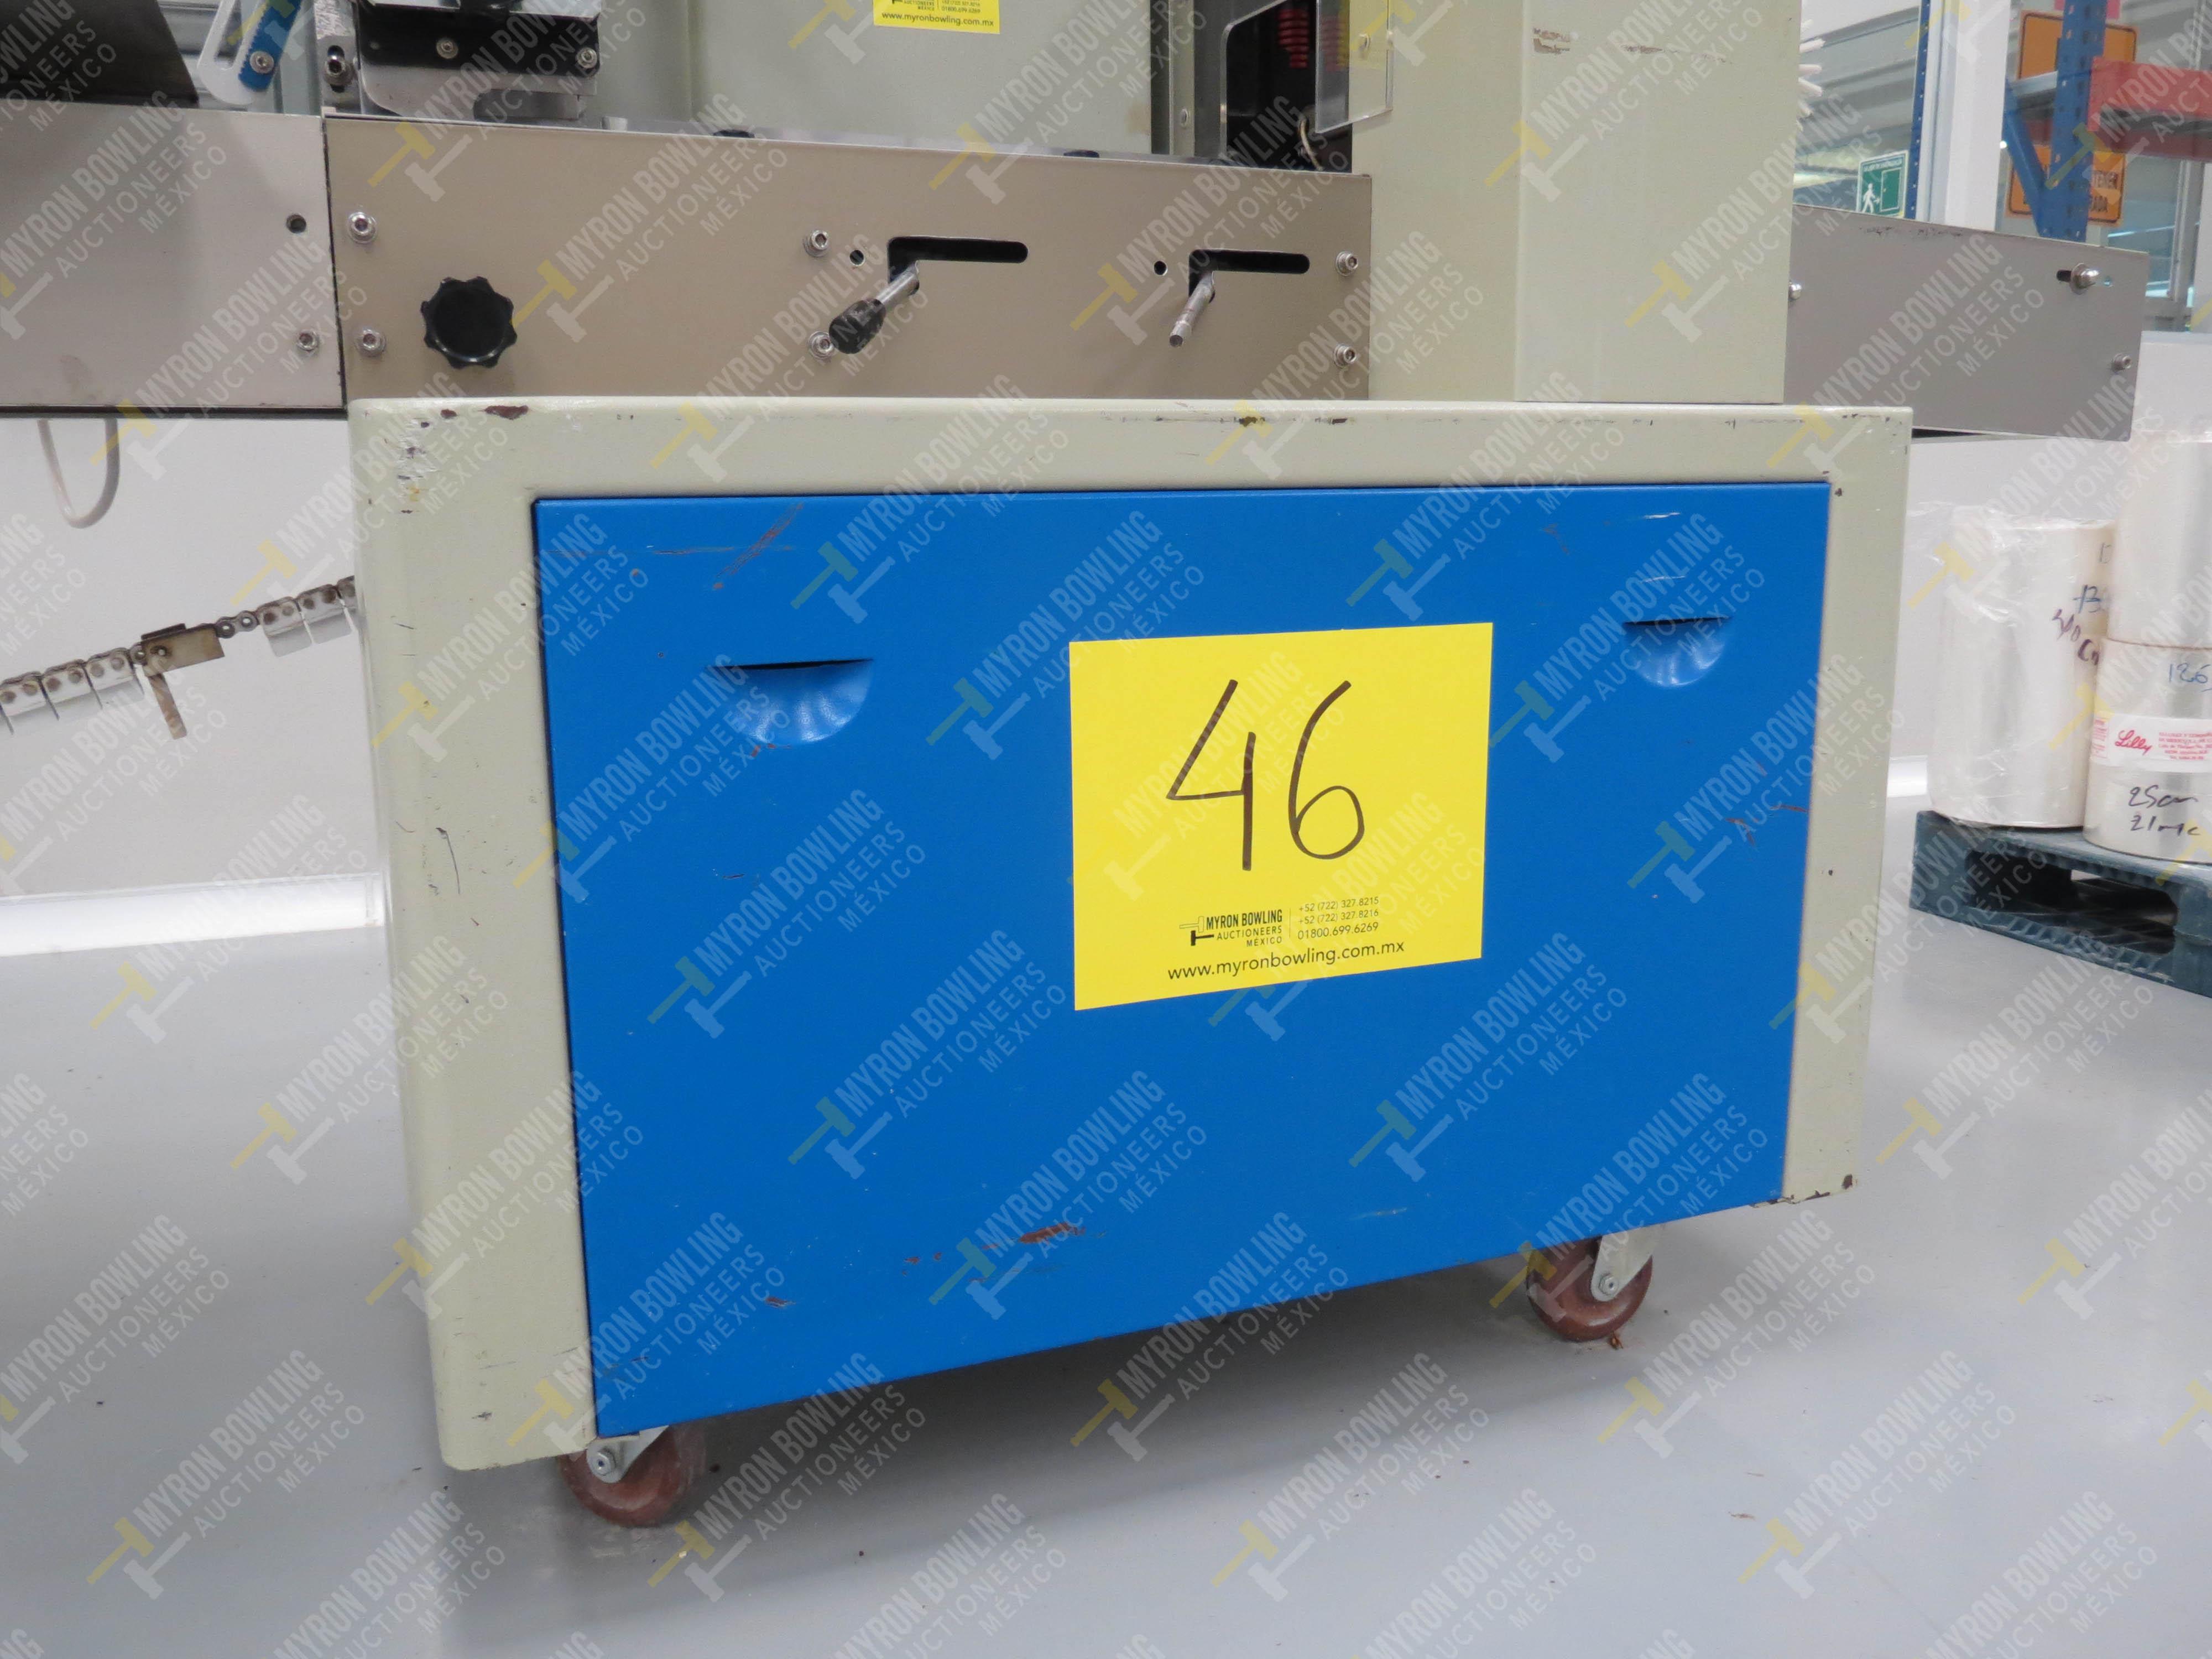 Máquina empacadora automática tipo almohadilla marca Shandong Saixin Inflating Machinery … - Image 7 of 9